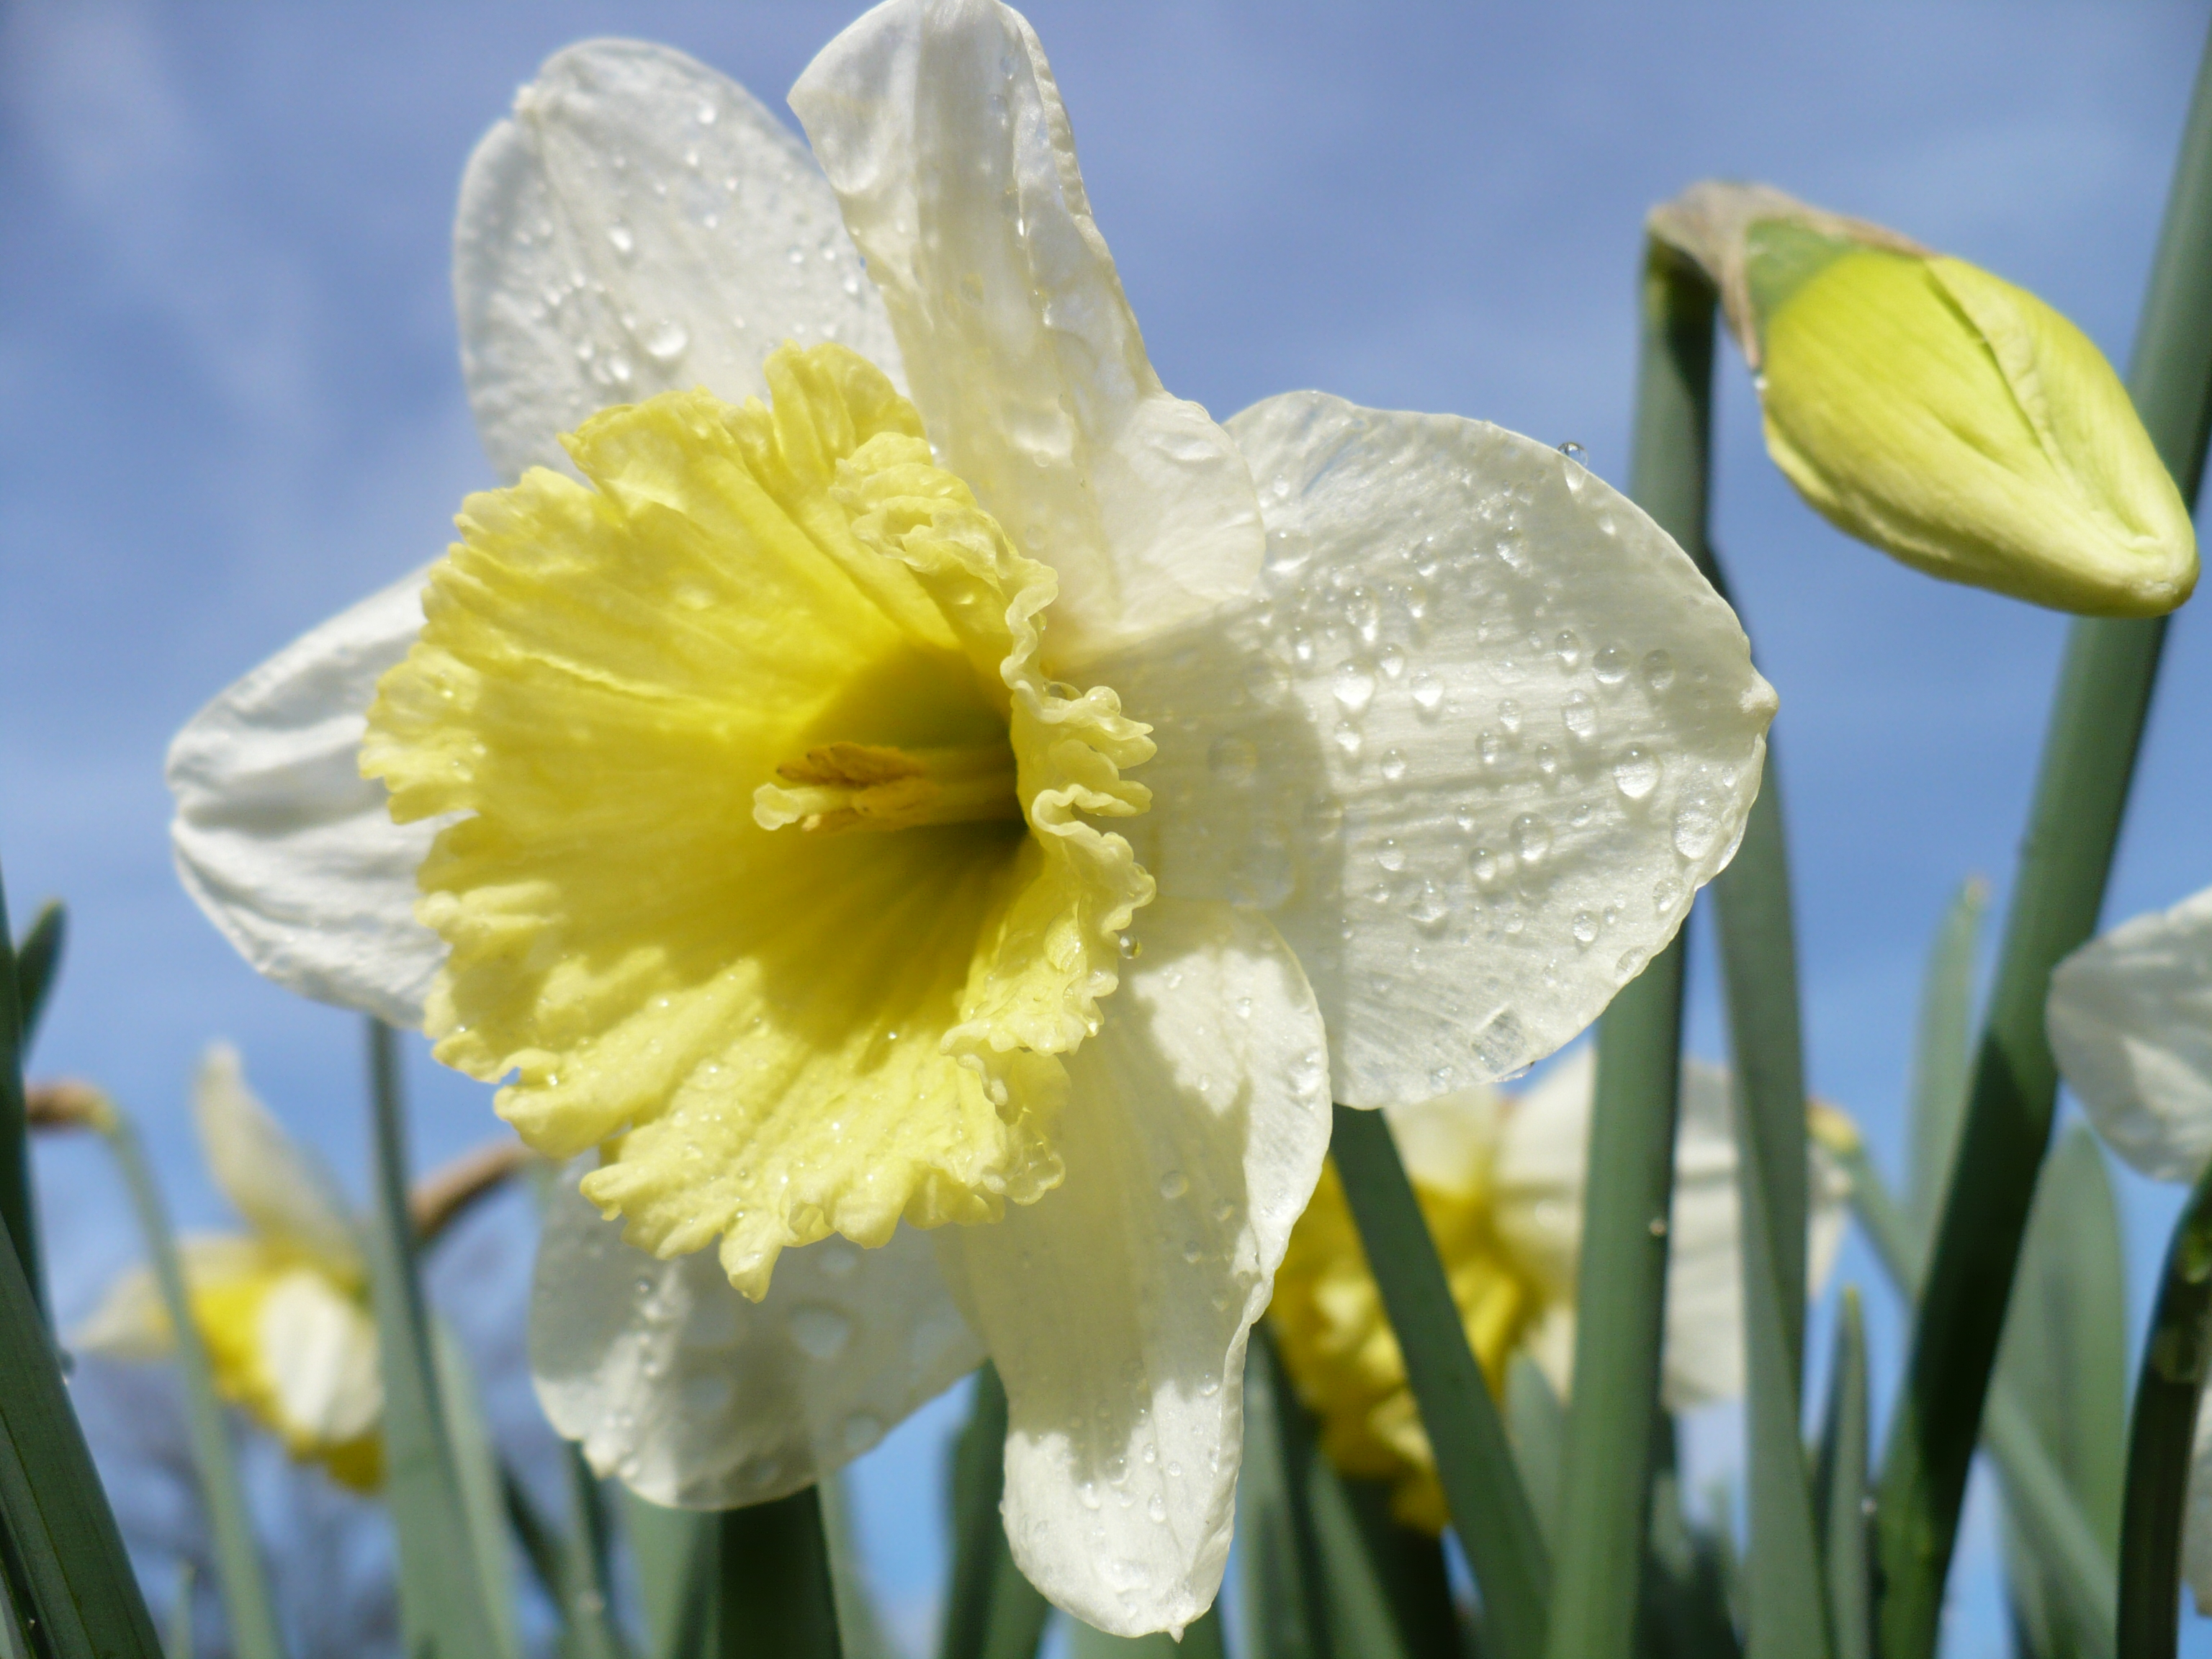 Daffodils, Bulbs, Closeup, Drops, Floral, HQ Photo